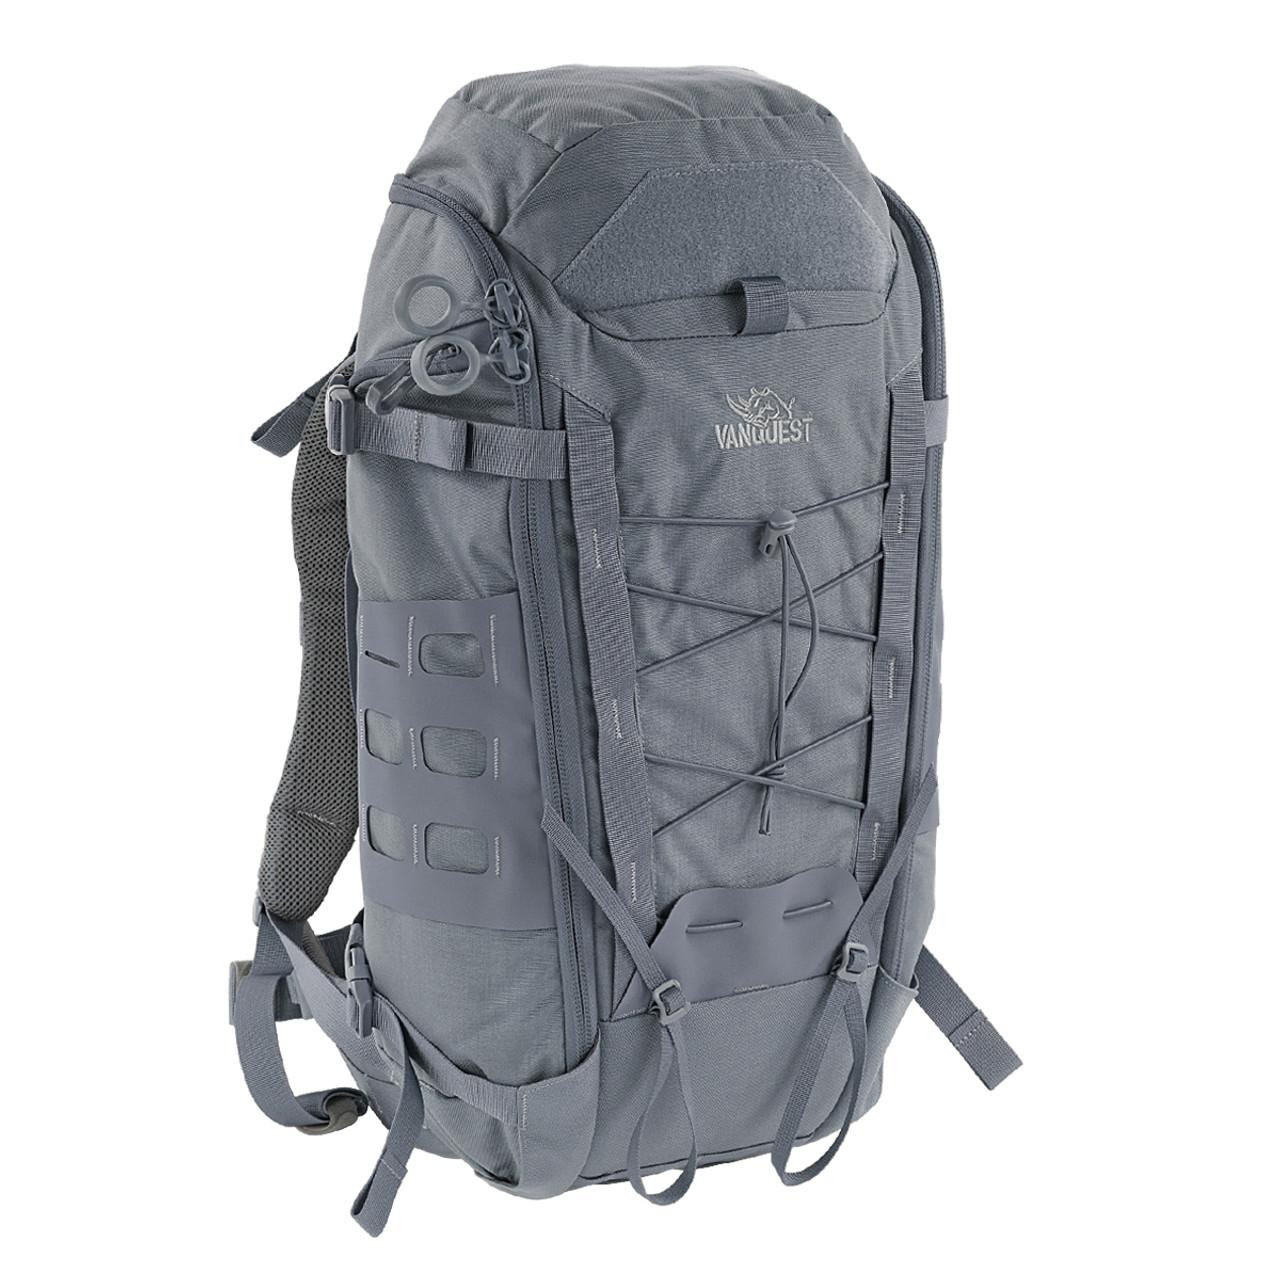 IBEX-26 Backpack - VANQUEST  TOUGH-BUILT GEAR 030d8d034e